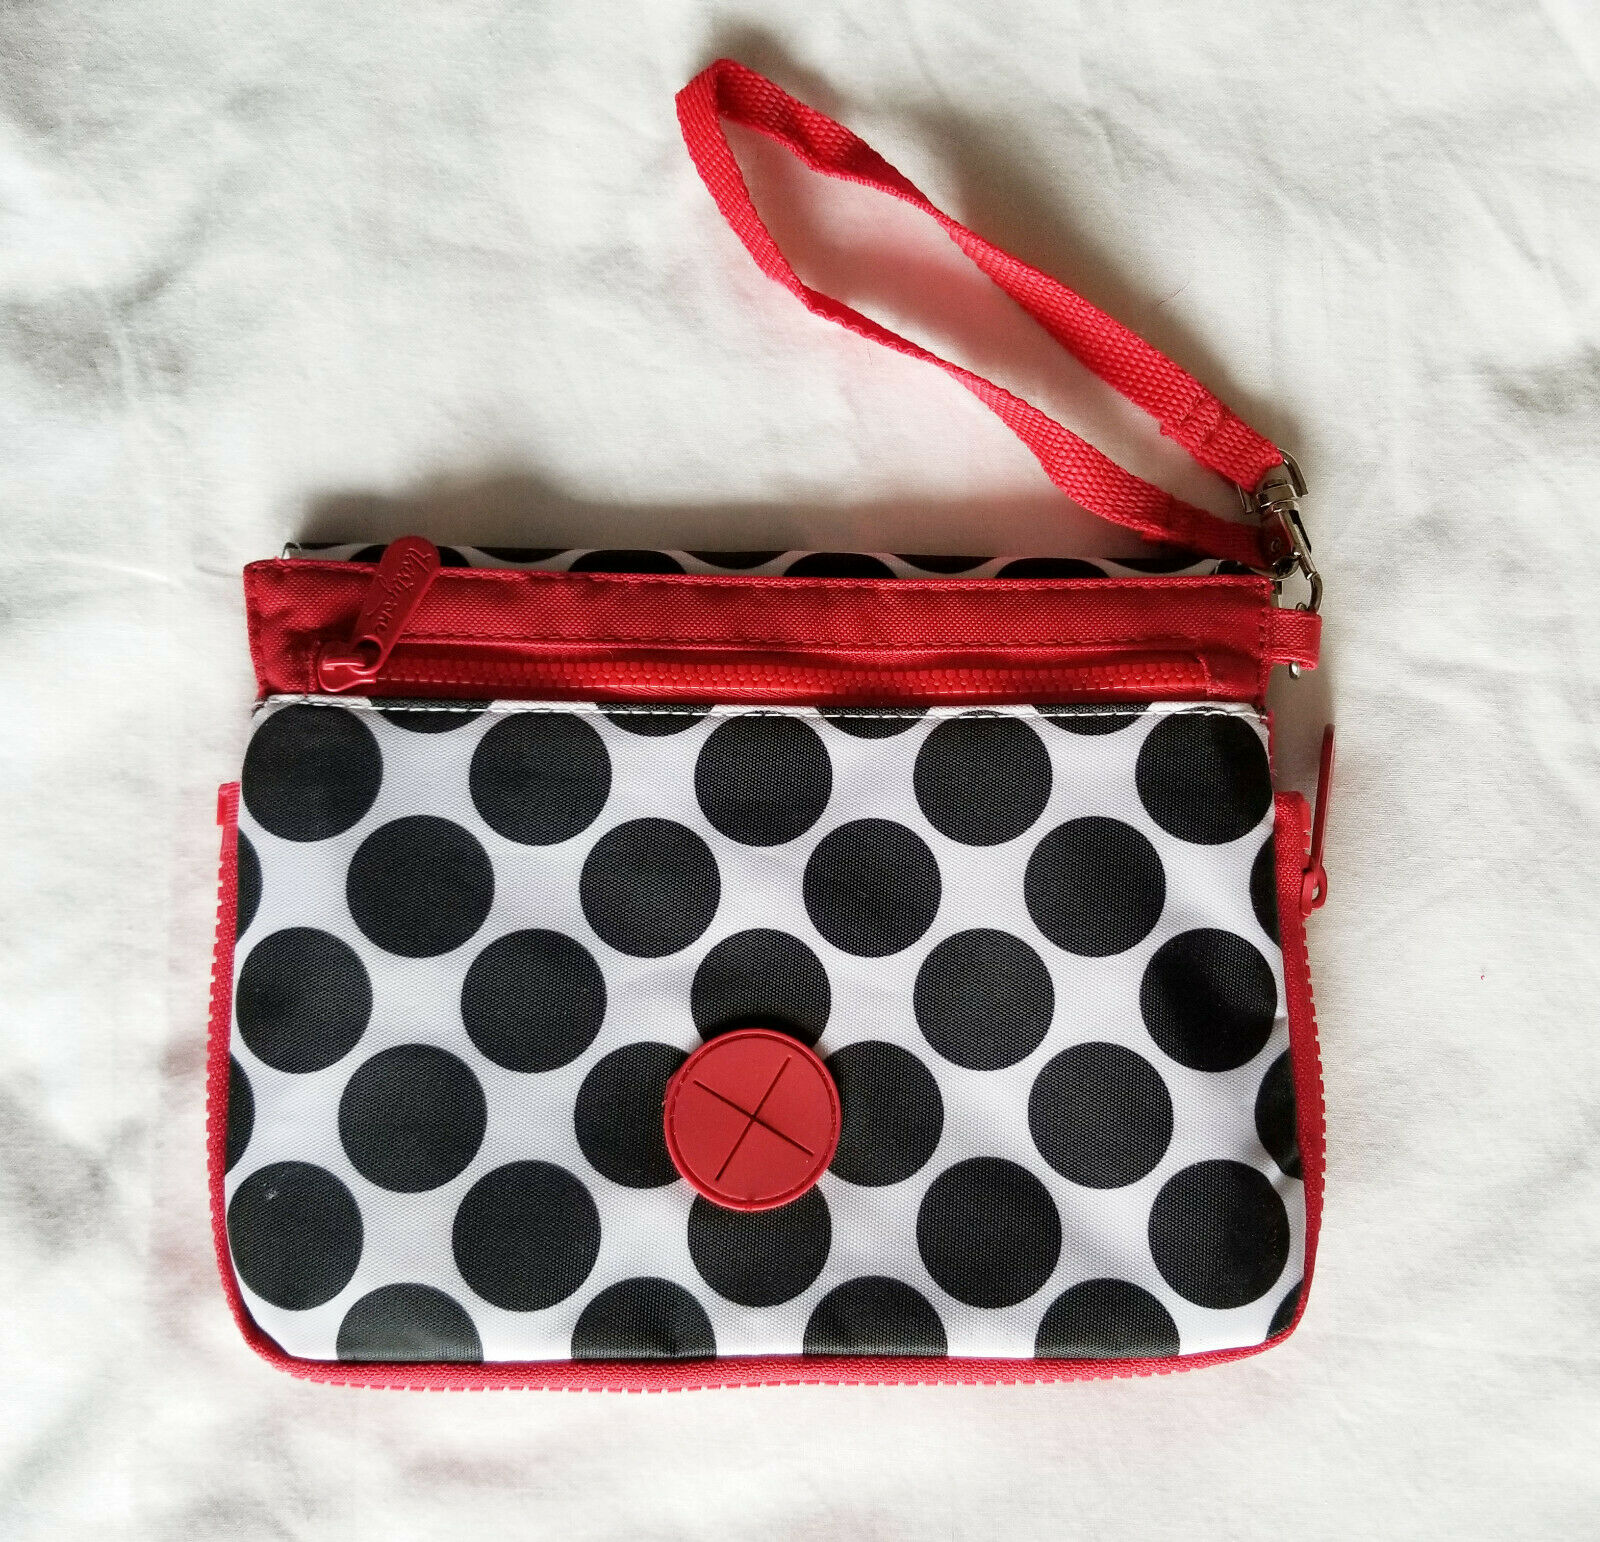 Pet Food/Water Bowl~Expandable Compact Wristlet Bag~White Red w/Black Polka Dots